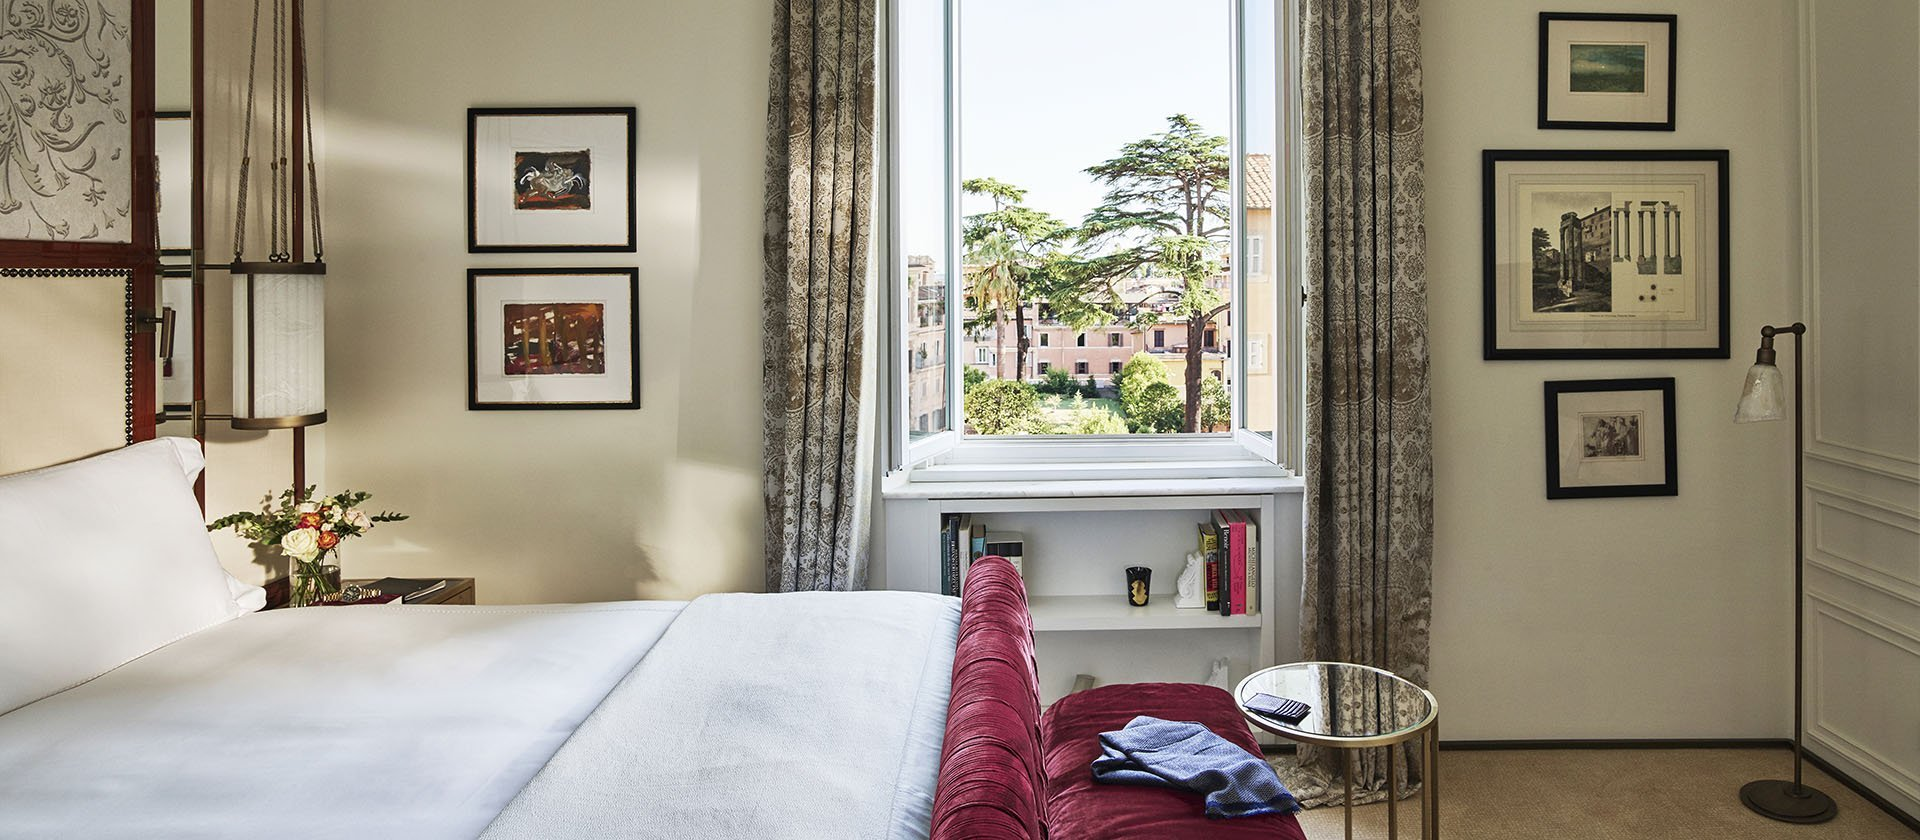 Bedroom in Dolce Vita suite at Hotel Eden